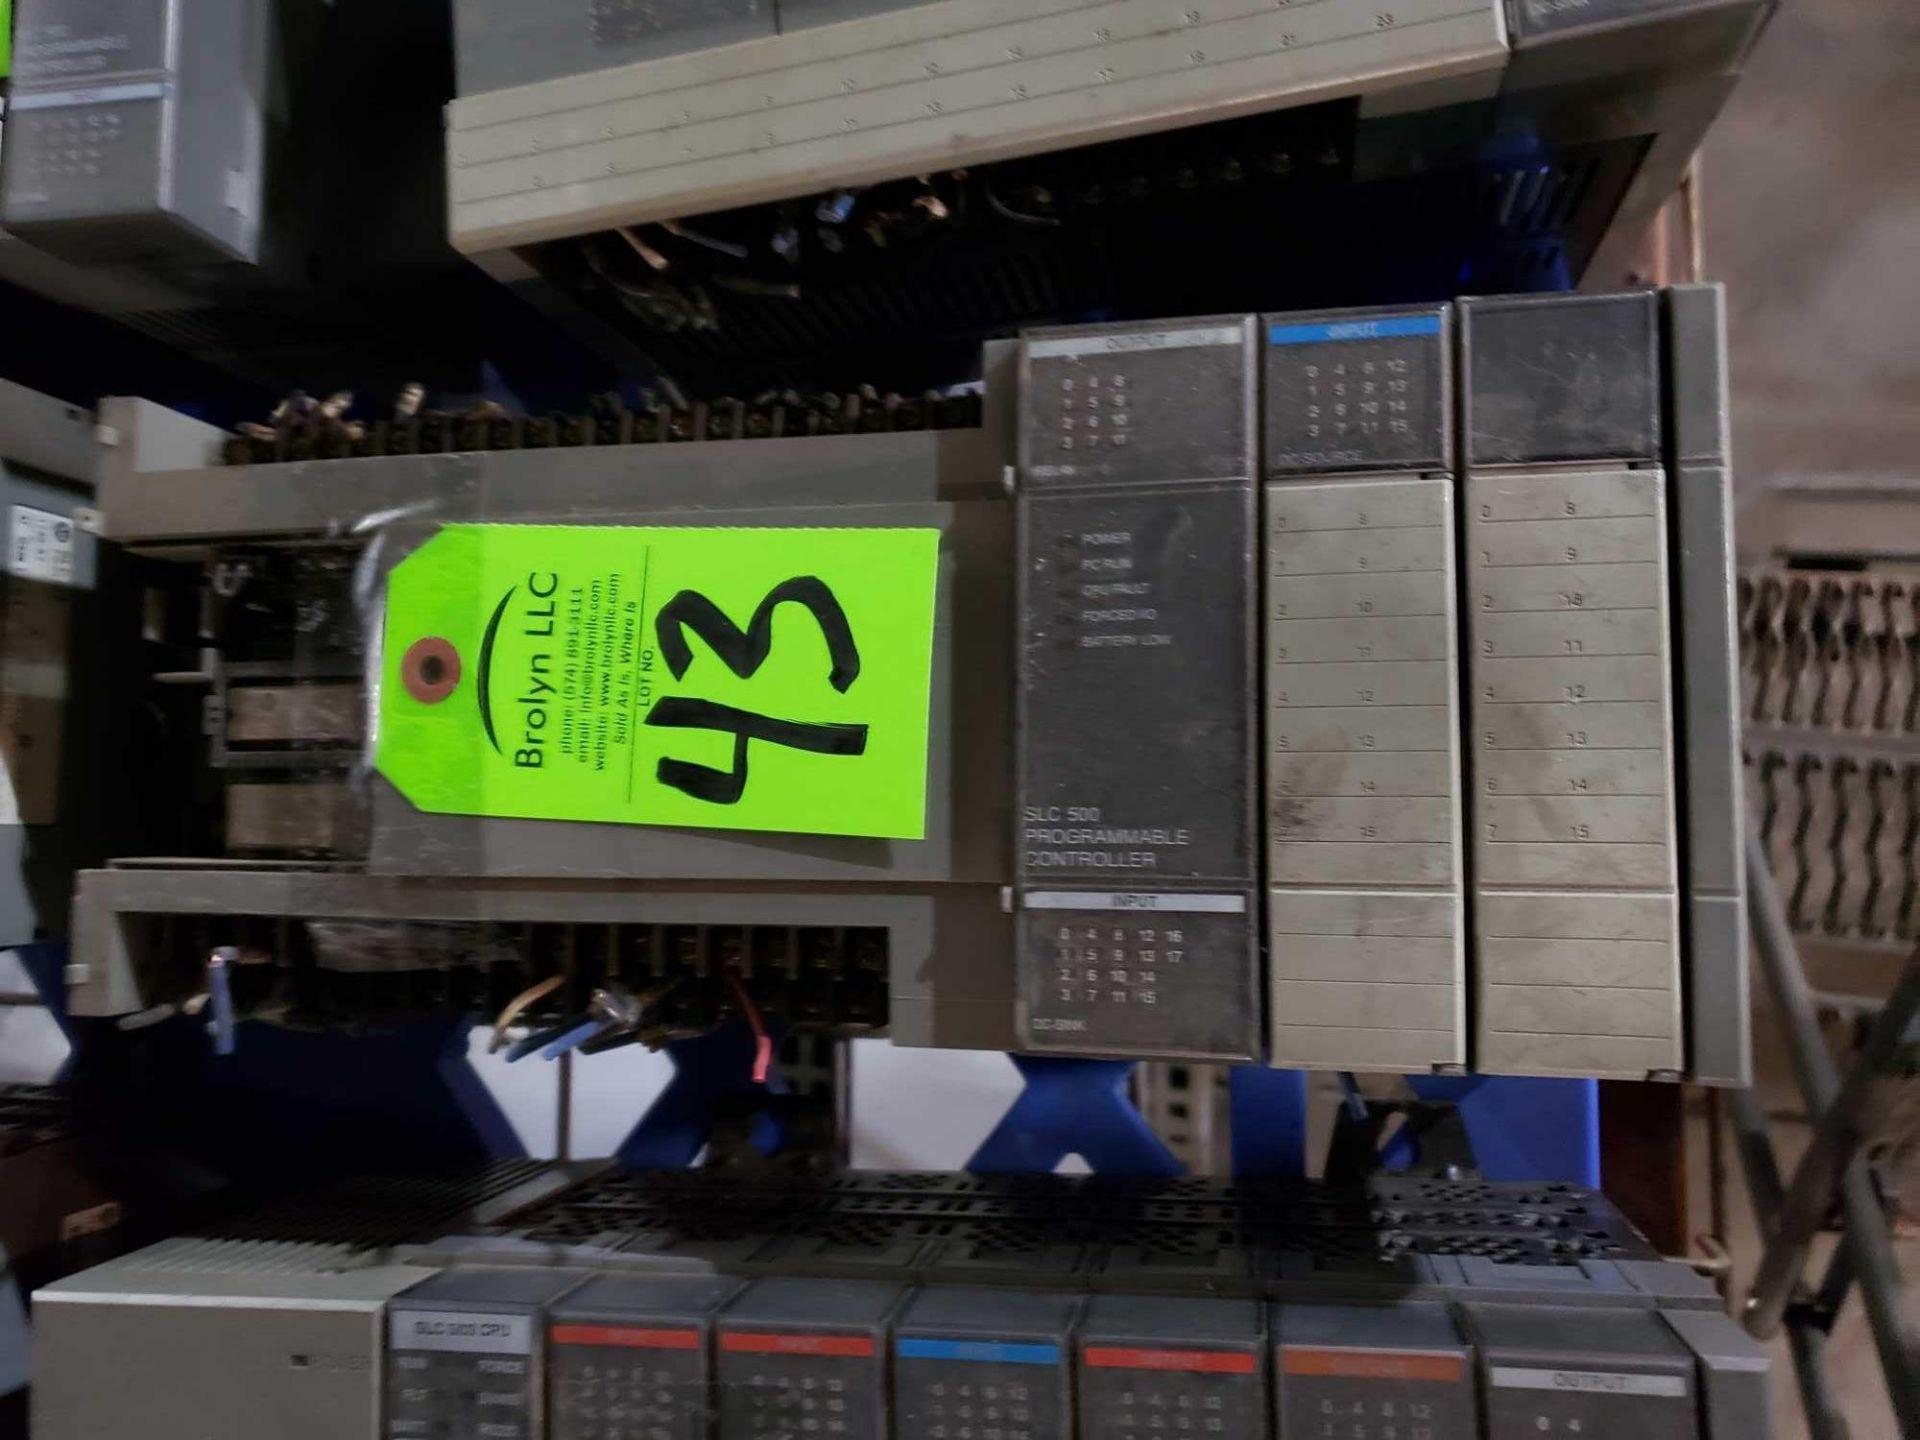 Lot 43 - Allen Bradley SLC500 programmable controller as pictured.